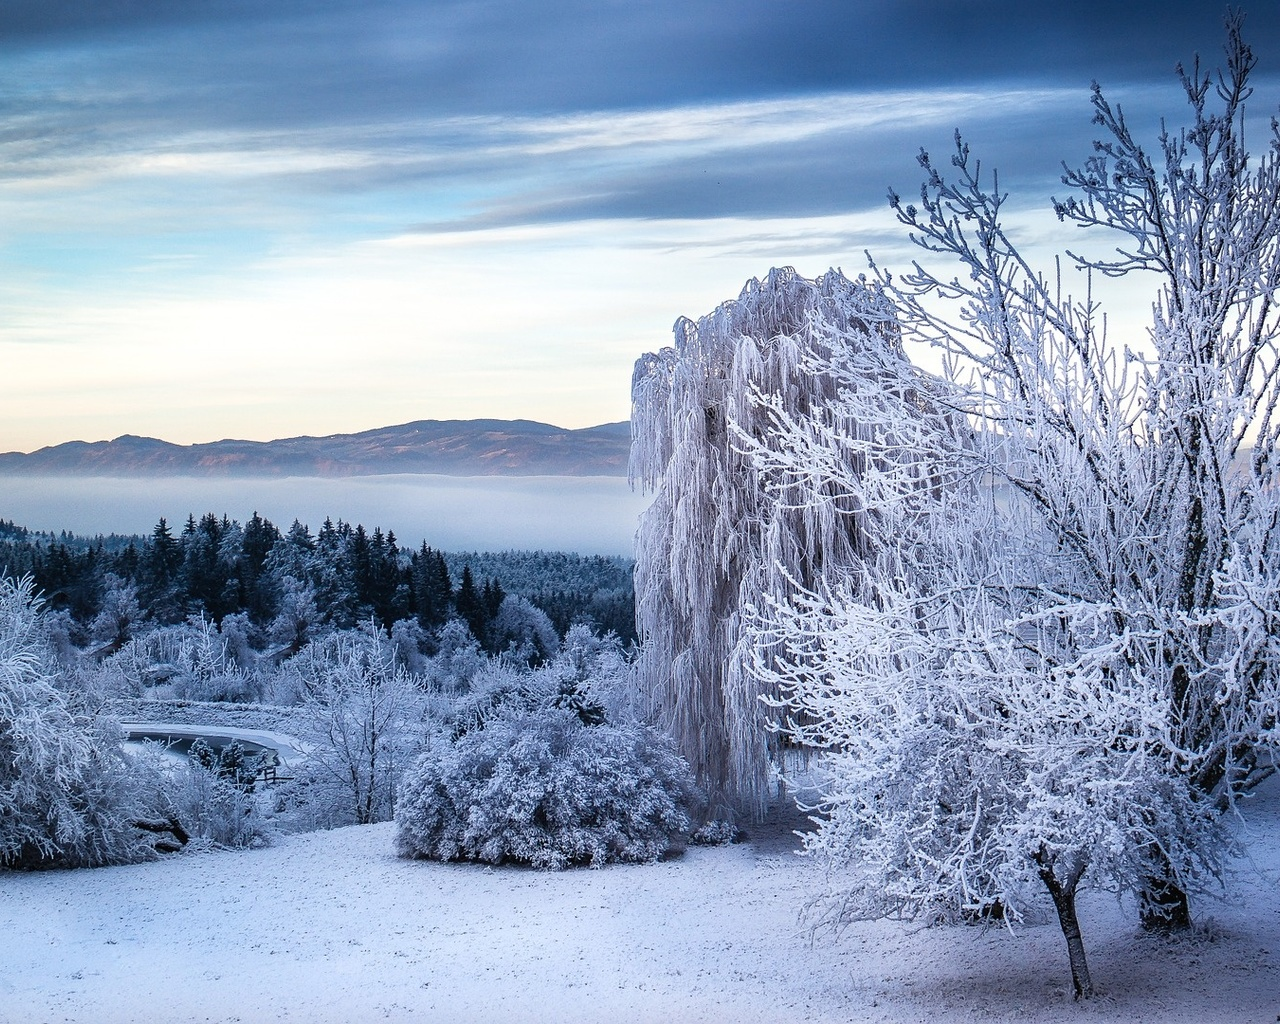 деревья, снег, пейзаж